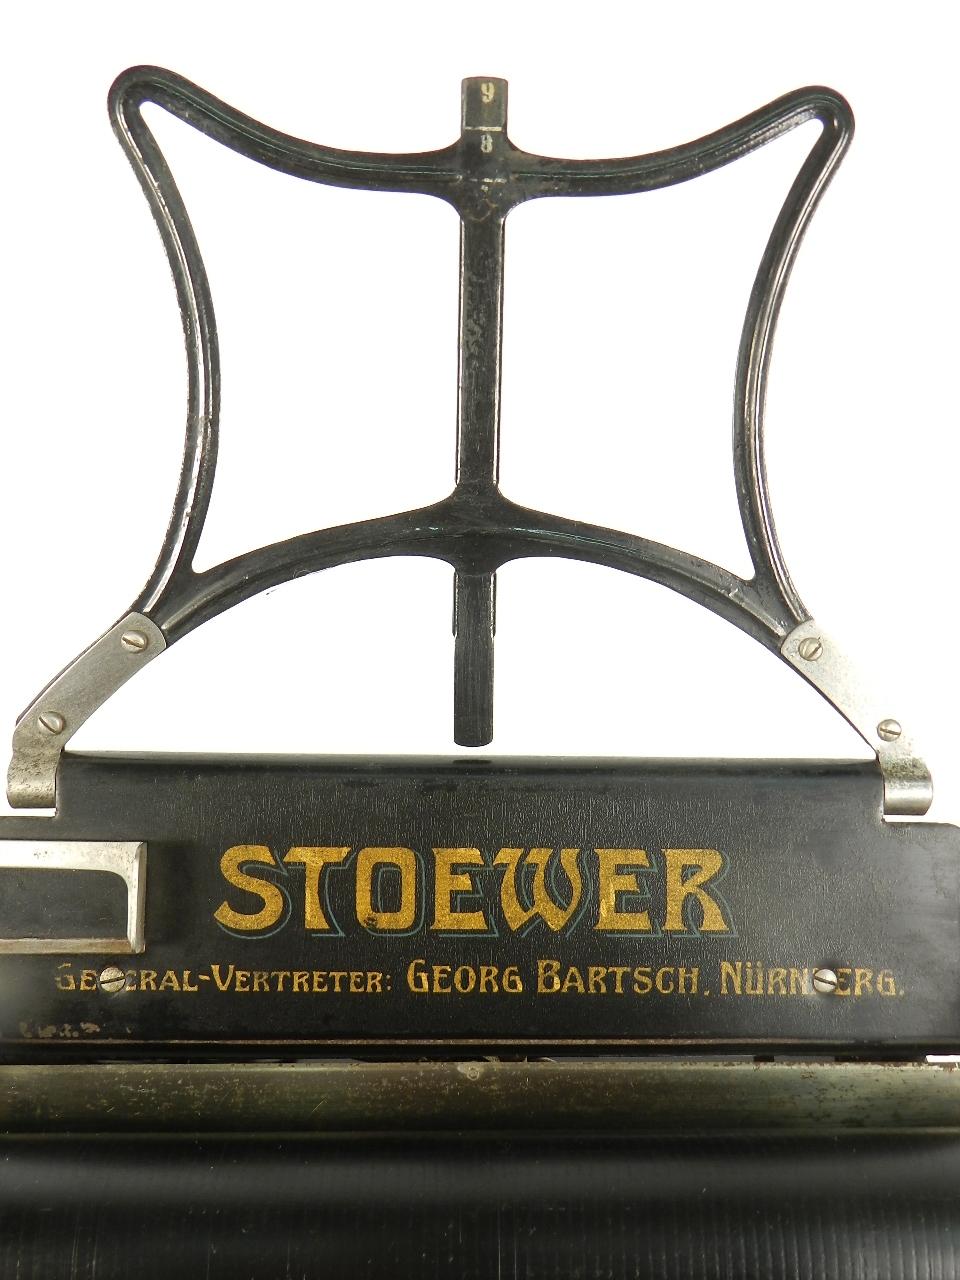 Imagen STOEWER RECORD AÑO 1910 32617